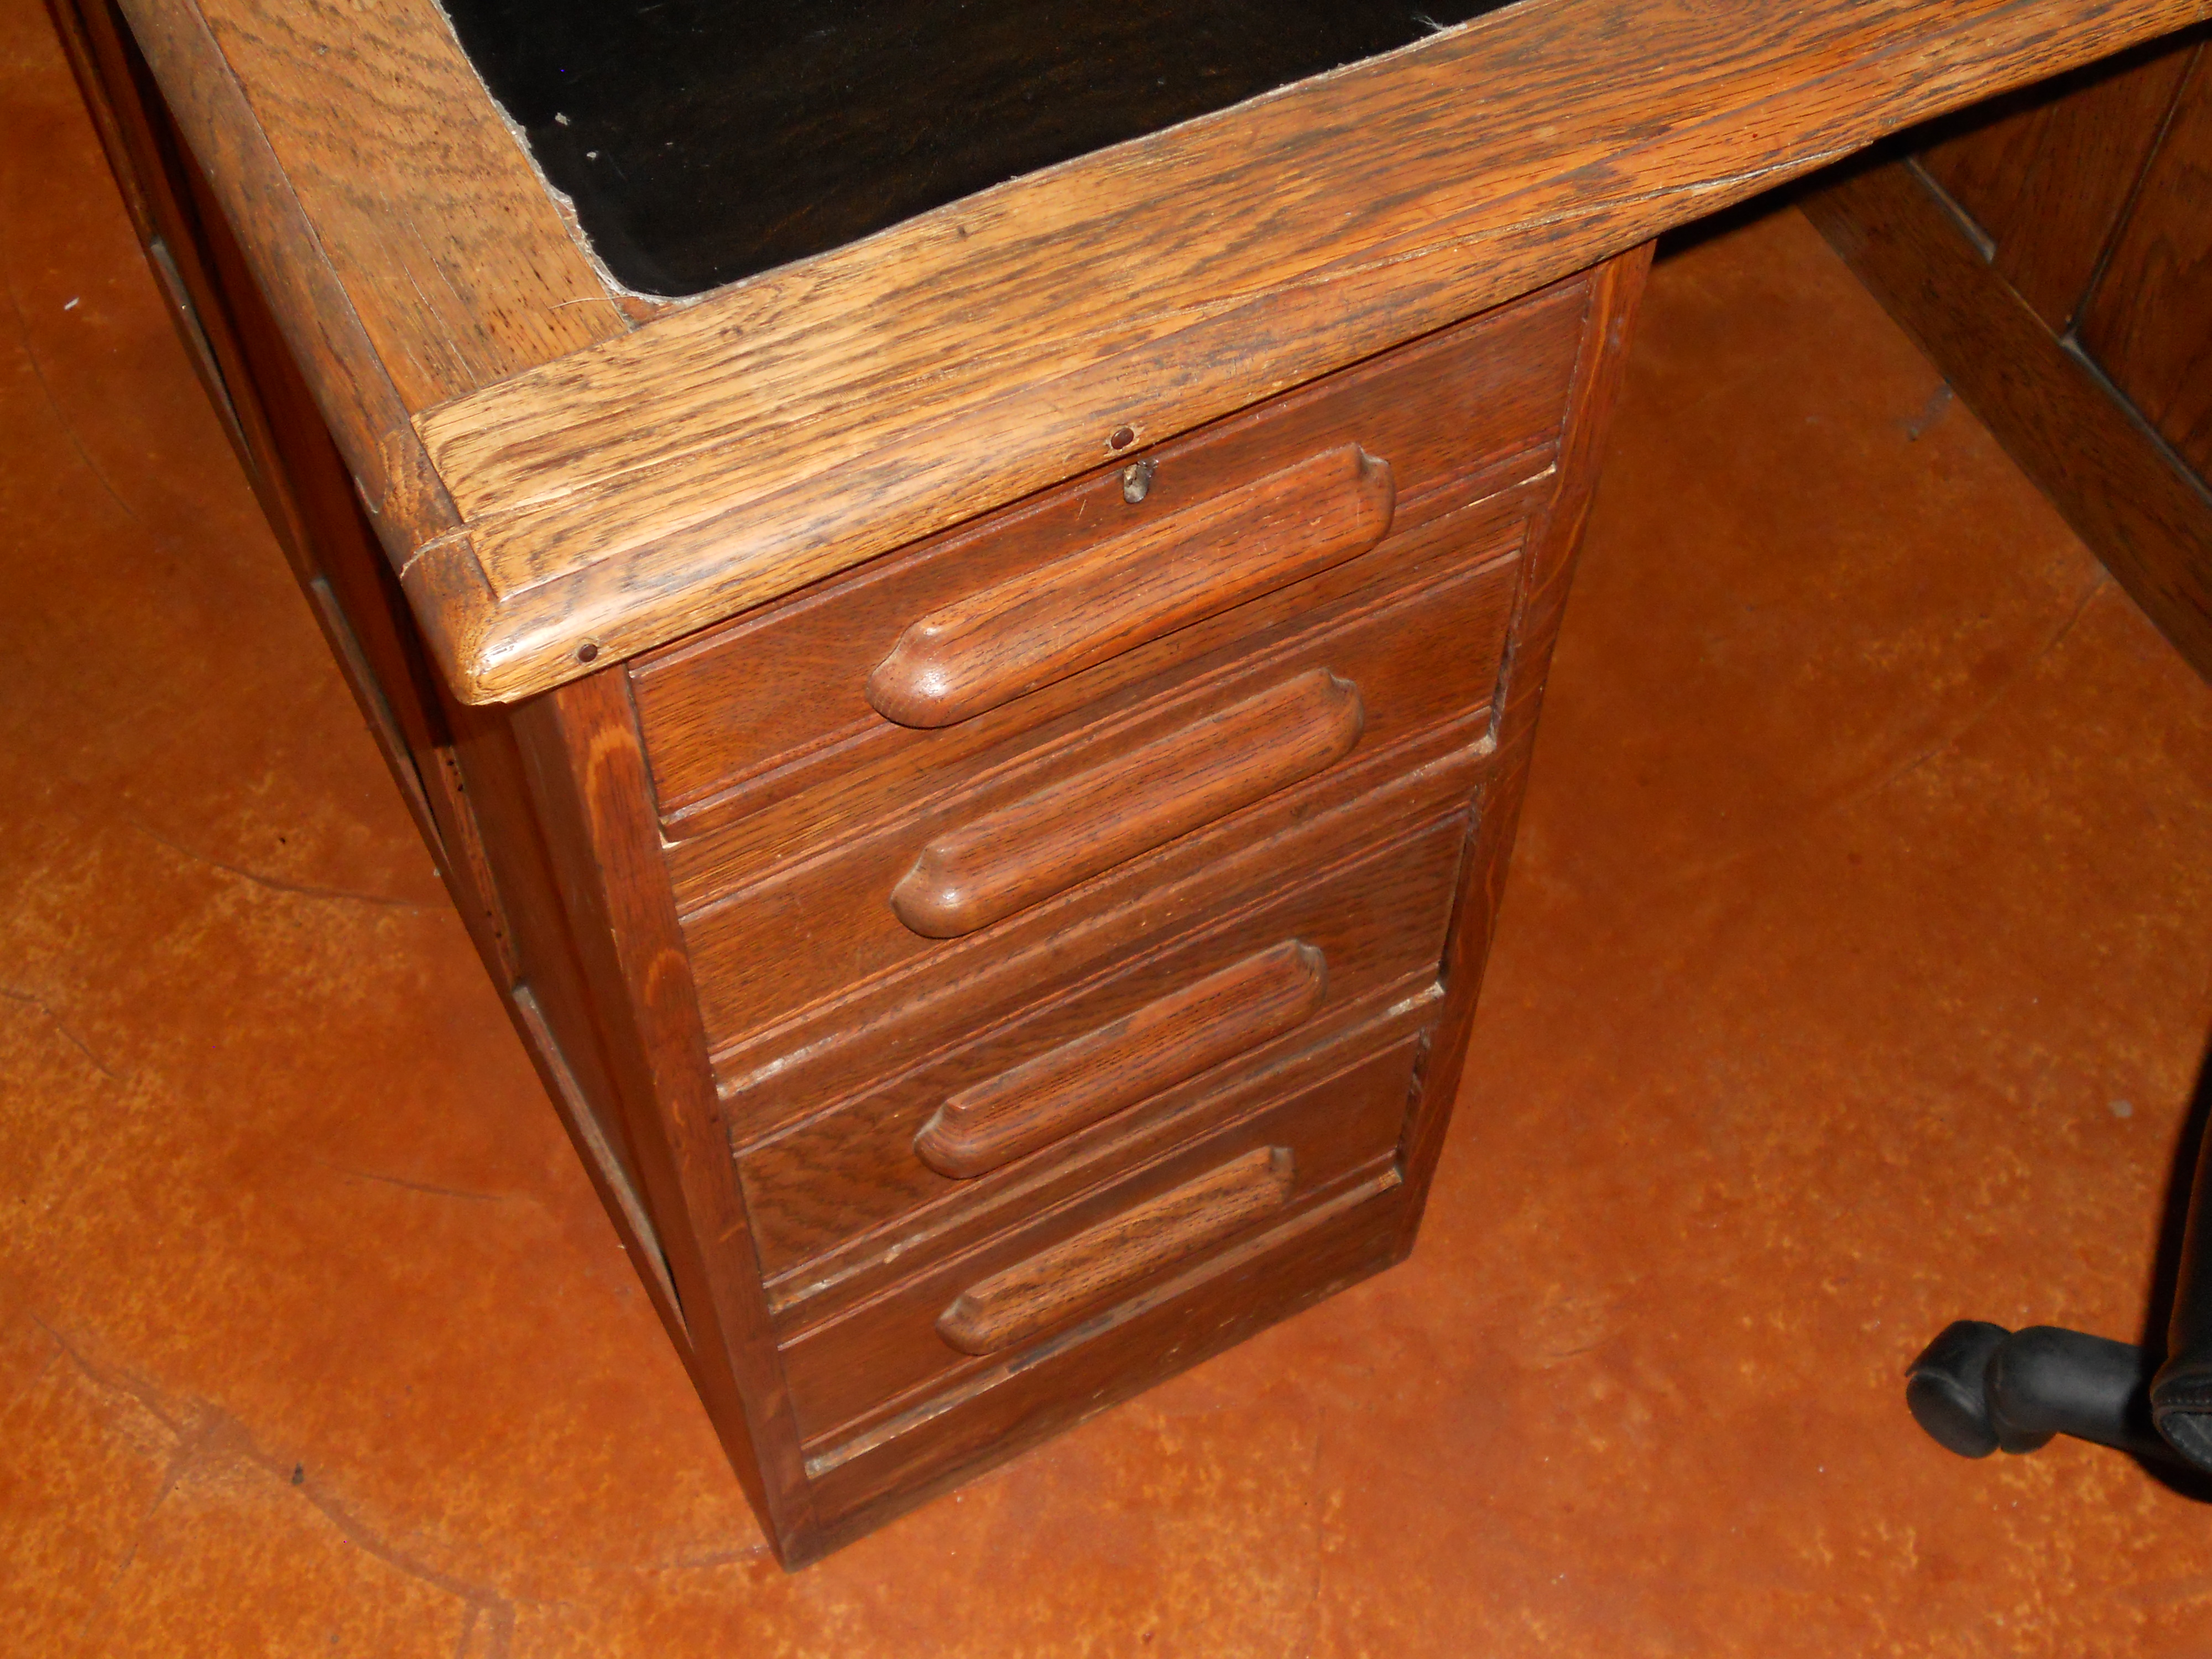 Vintage wooden office desk for sale classifieds - Antique office desk ...